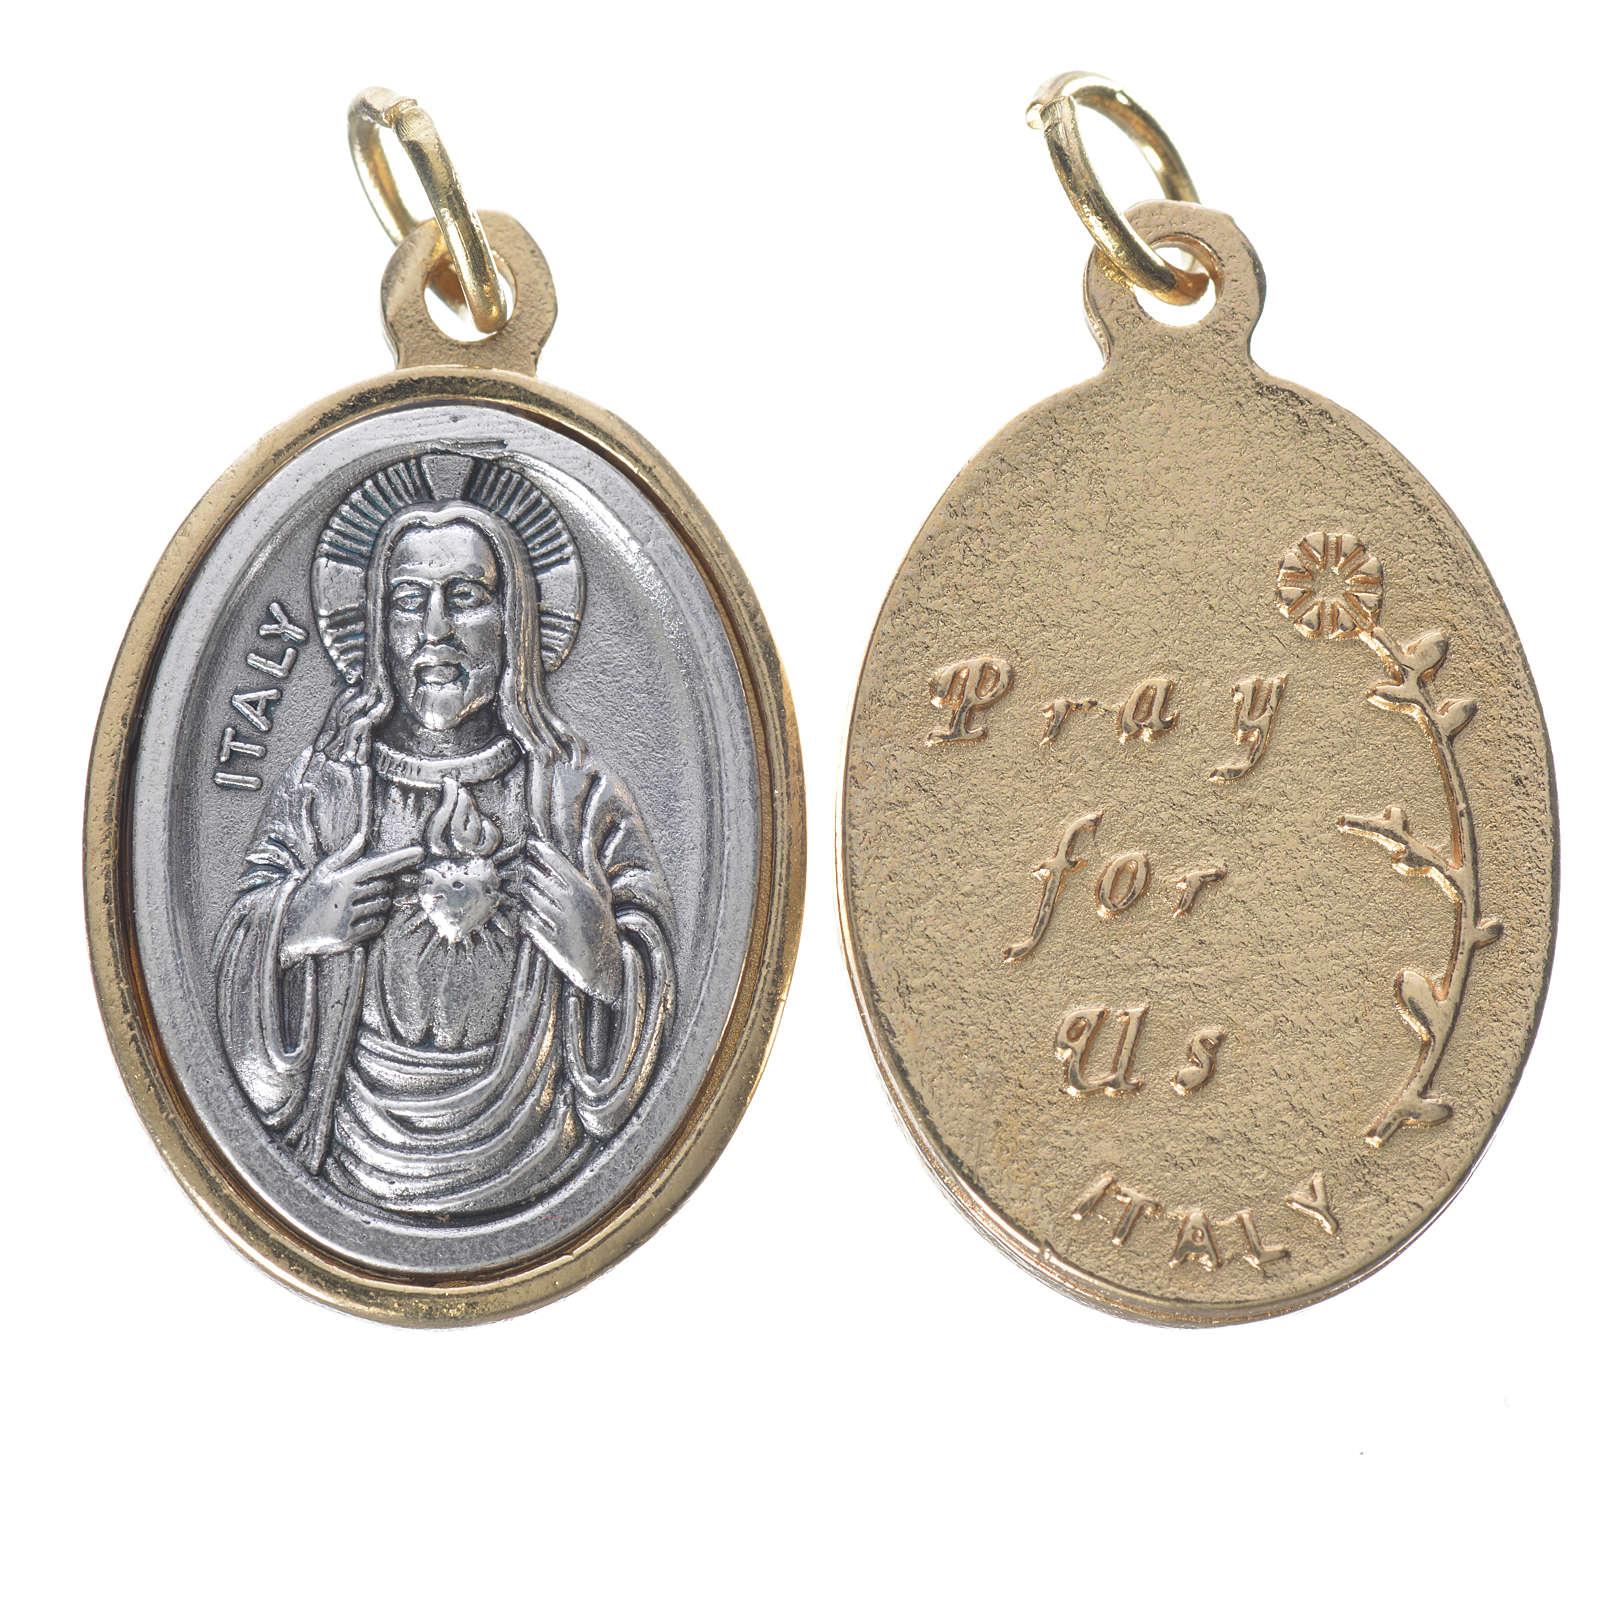 Medaille Heiliges Herz Jesu Metall vergoldet versilbert 2,5cm groß 4